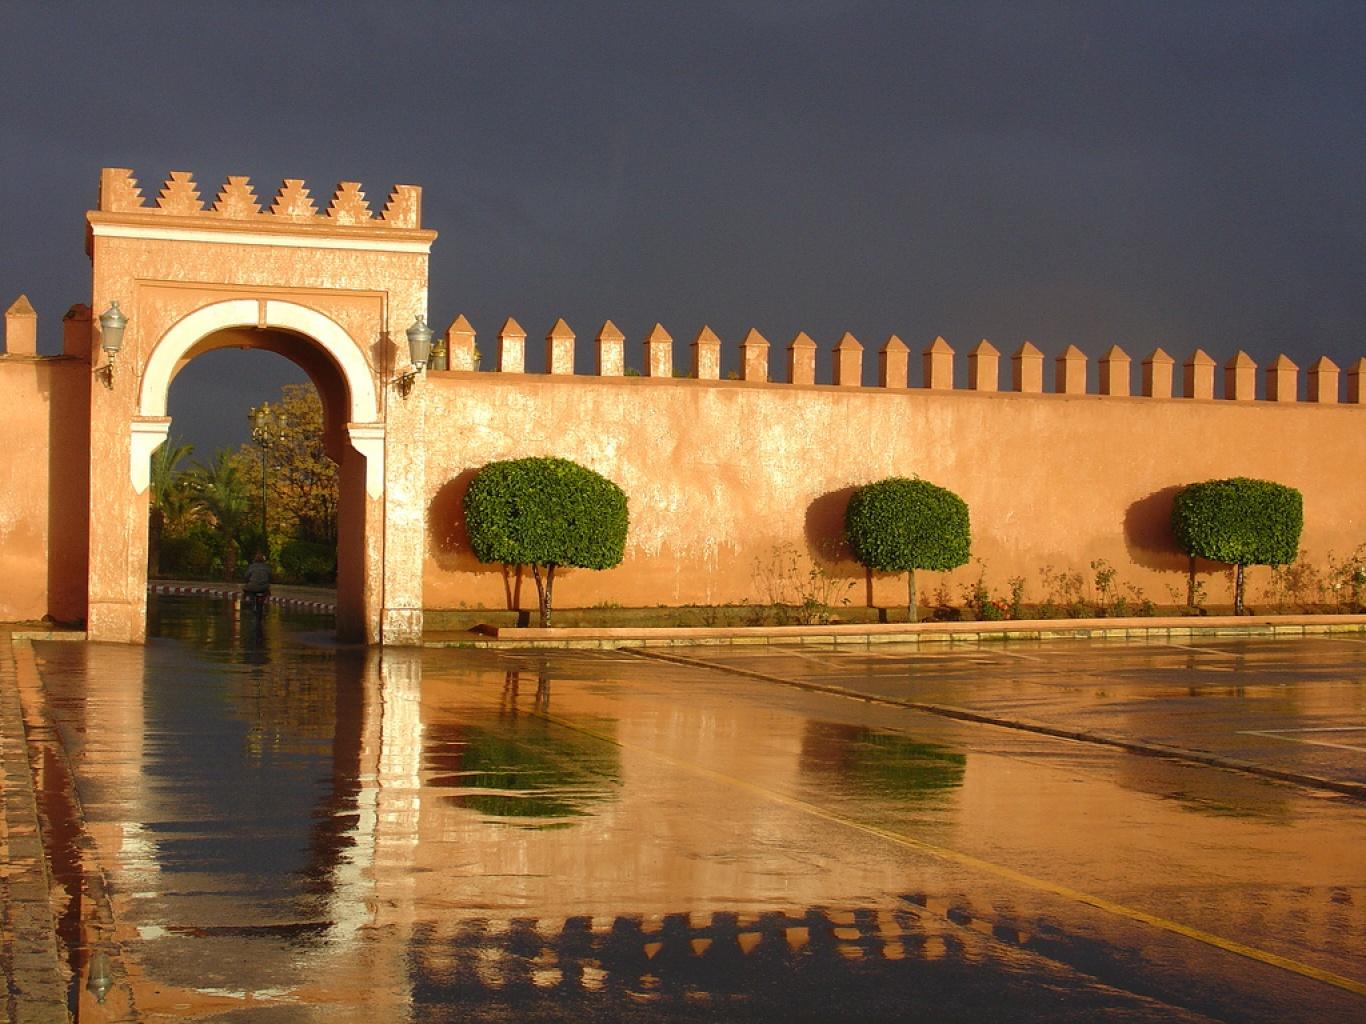 1366_1269645946_muros-medina-marrakech-marruecos